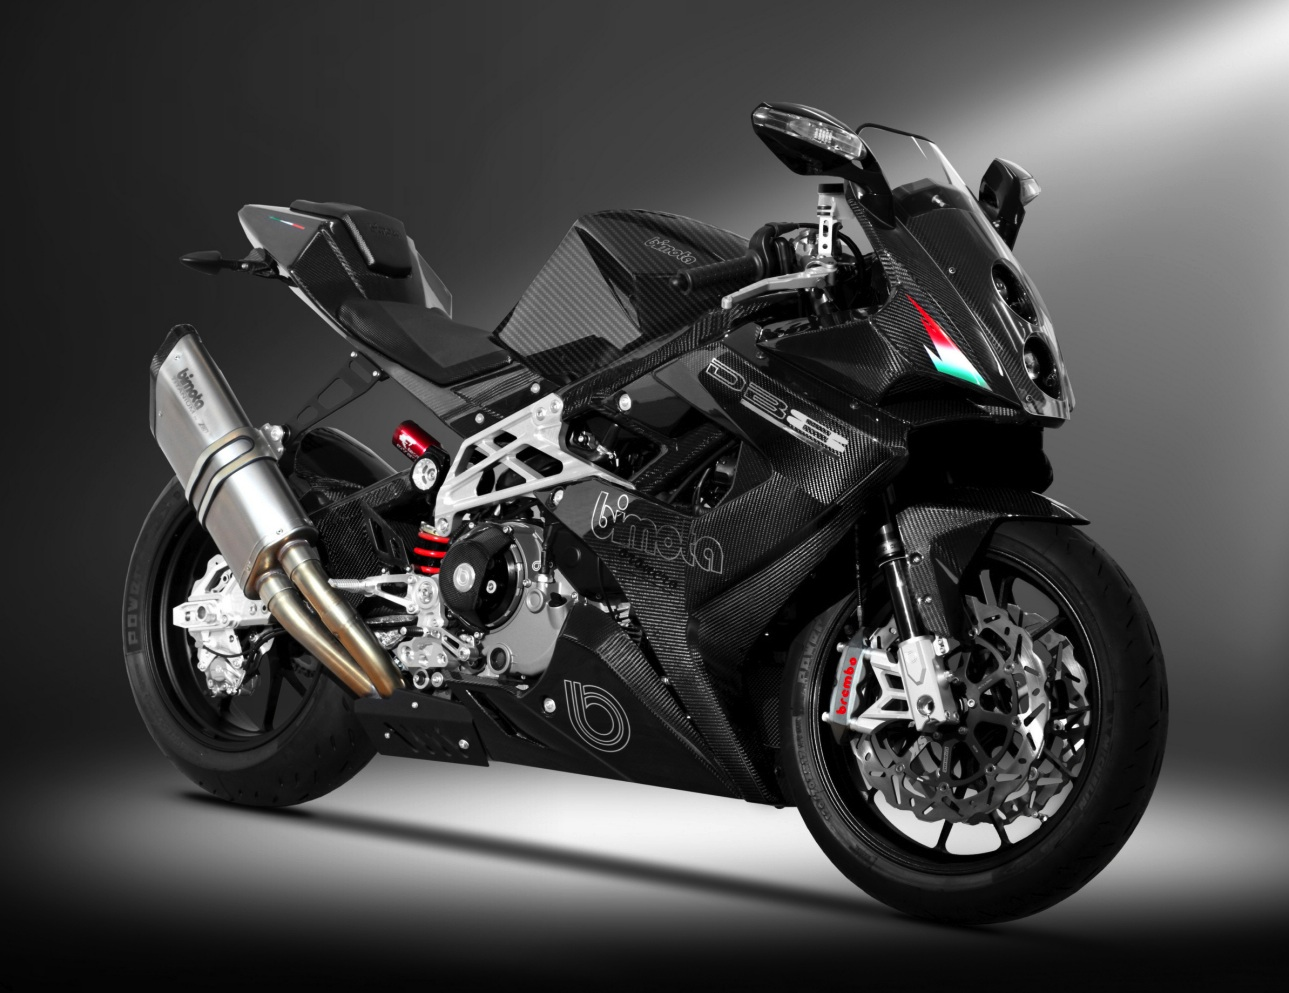 Super Deals For Exotic Superbikes Motorbike Writer